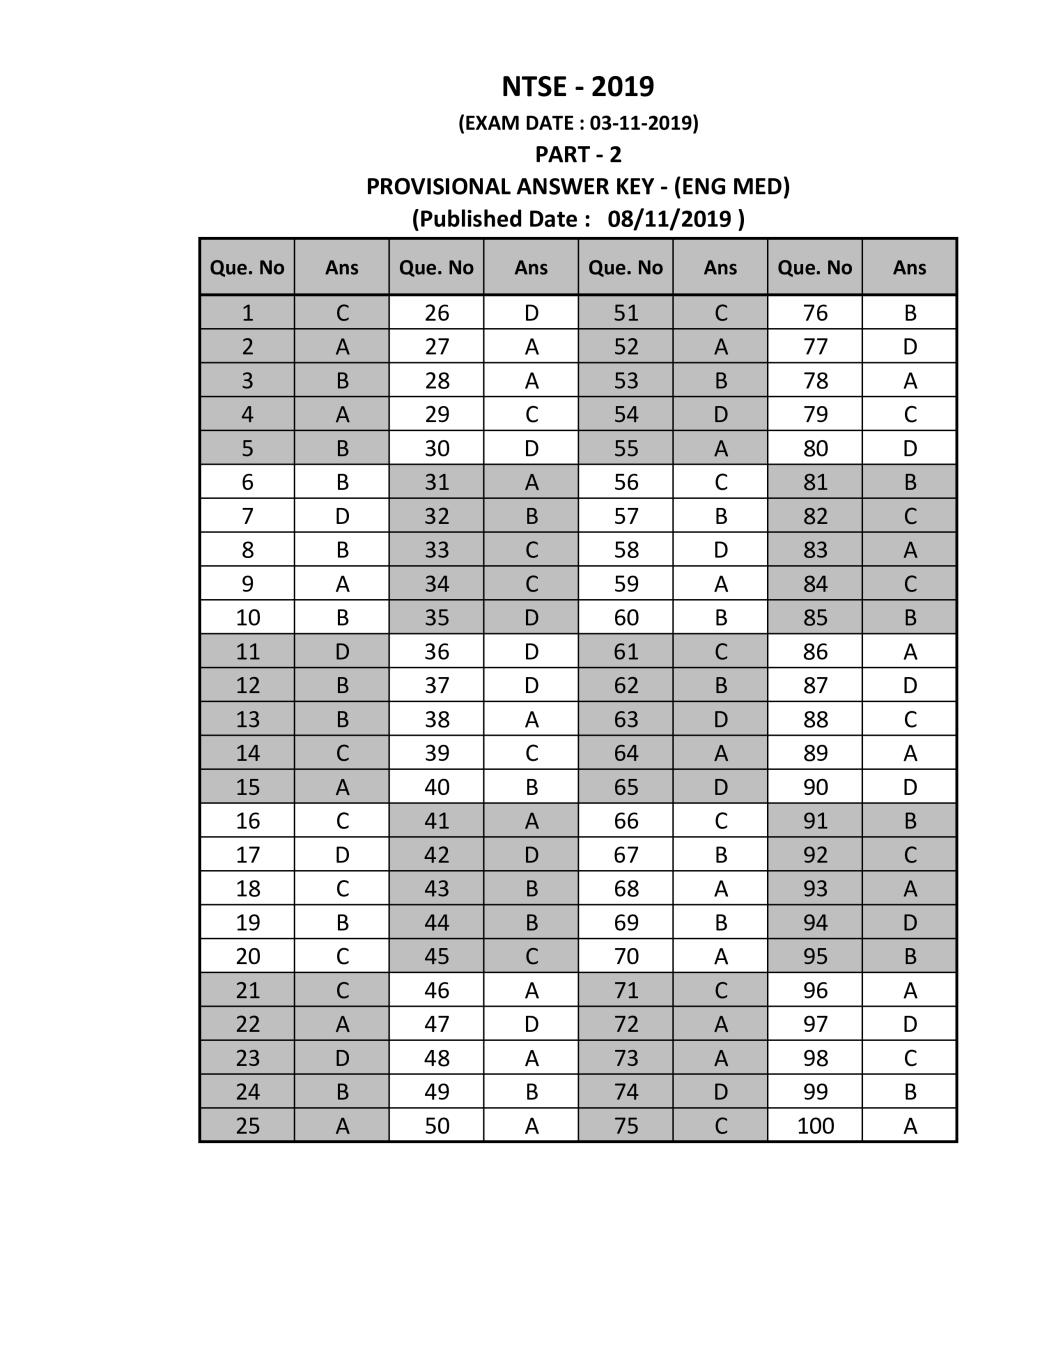 Gujarat NTSE Nov 2019 SAT Answer Key English Medium - Page 1